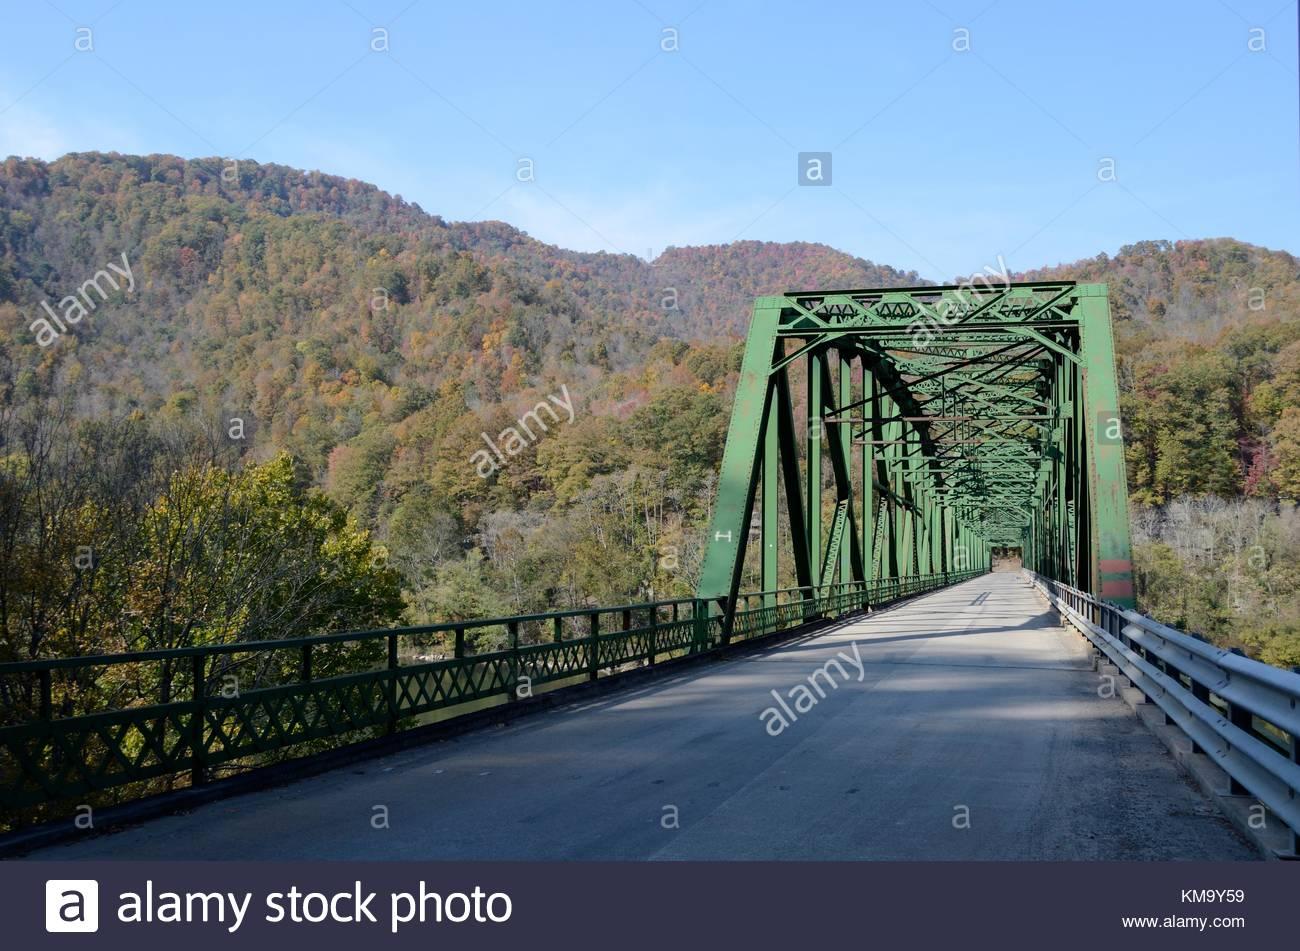 Historic Kanawha Falls Bridge - a triple span Pennsylvania Truss Bridge over the Kanawha River in West Virginia. Stock Photo